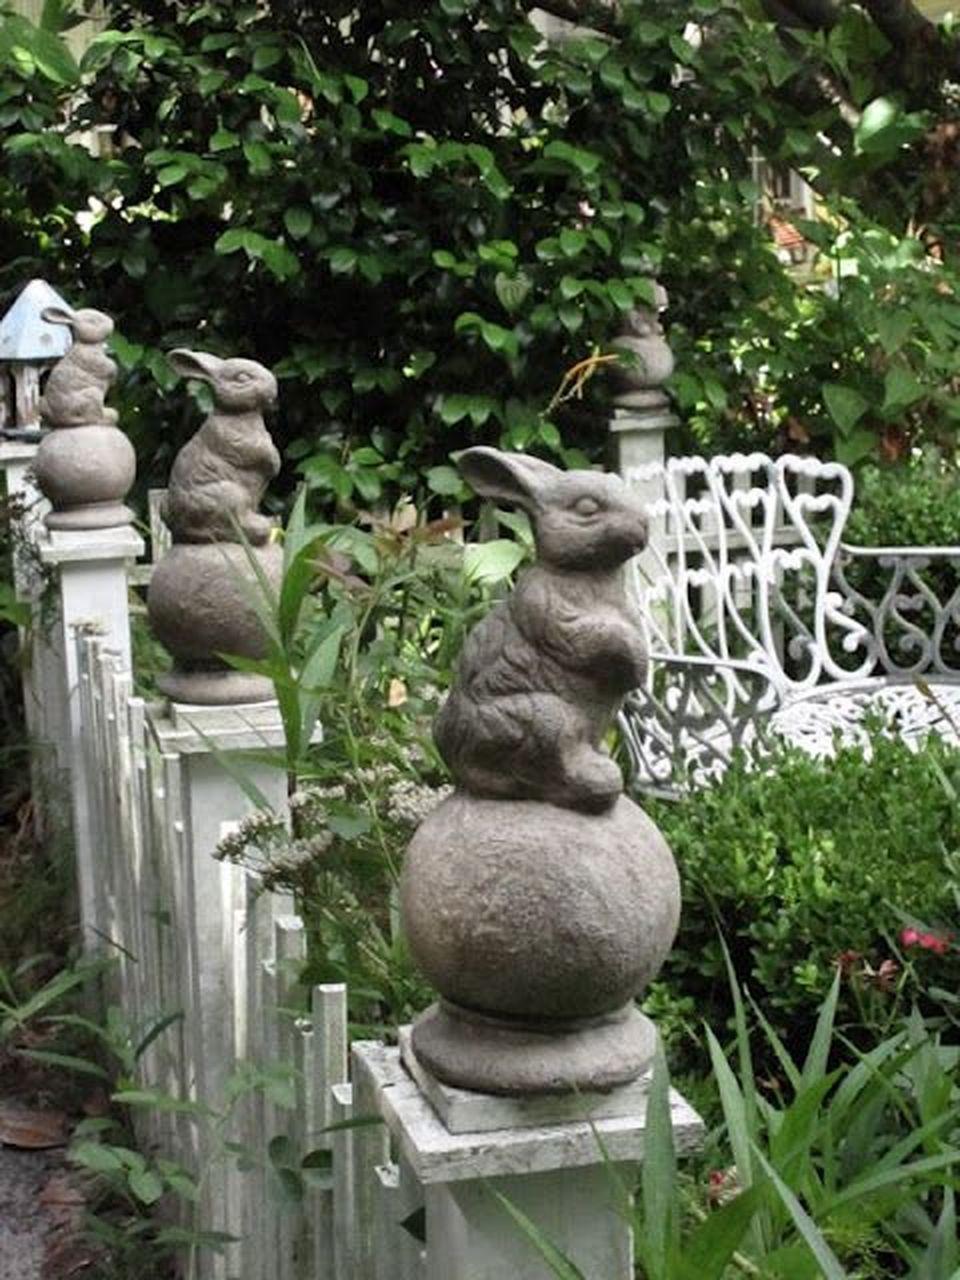 60 Amazing Garden Gates And Fence Design Ideas With Images Garden Gates And Fencing Garden Inspiration Dream Garden